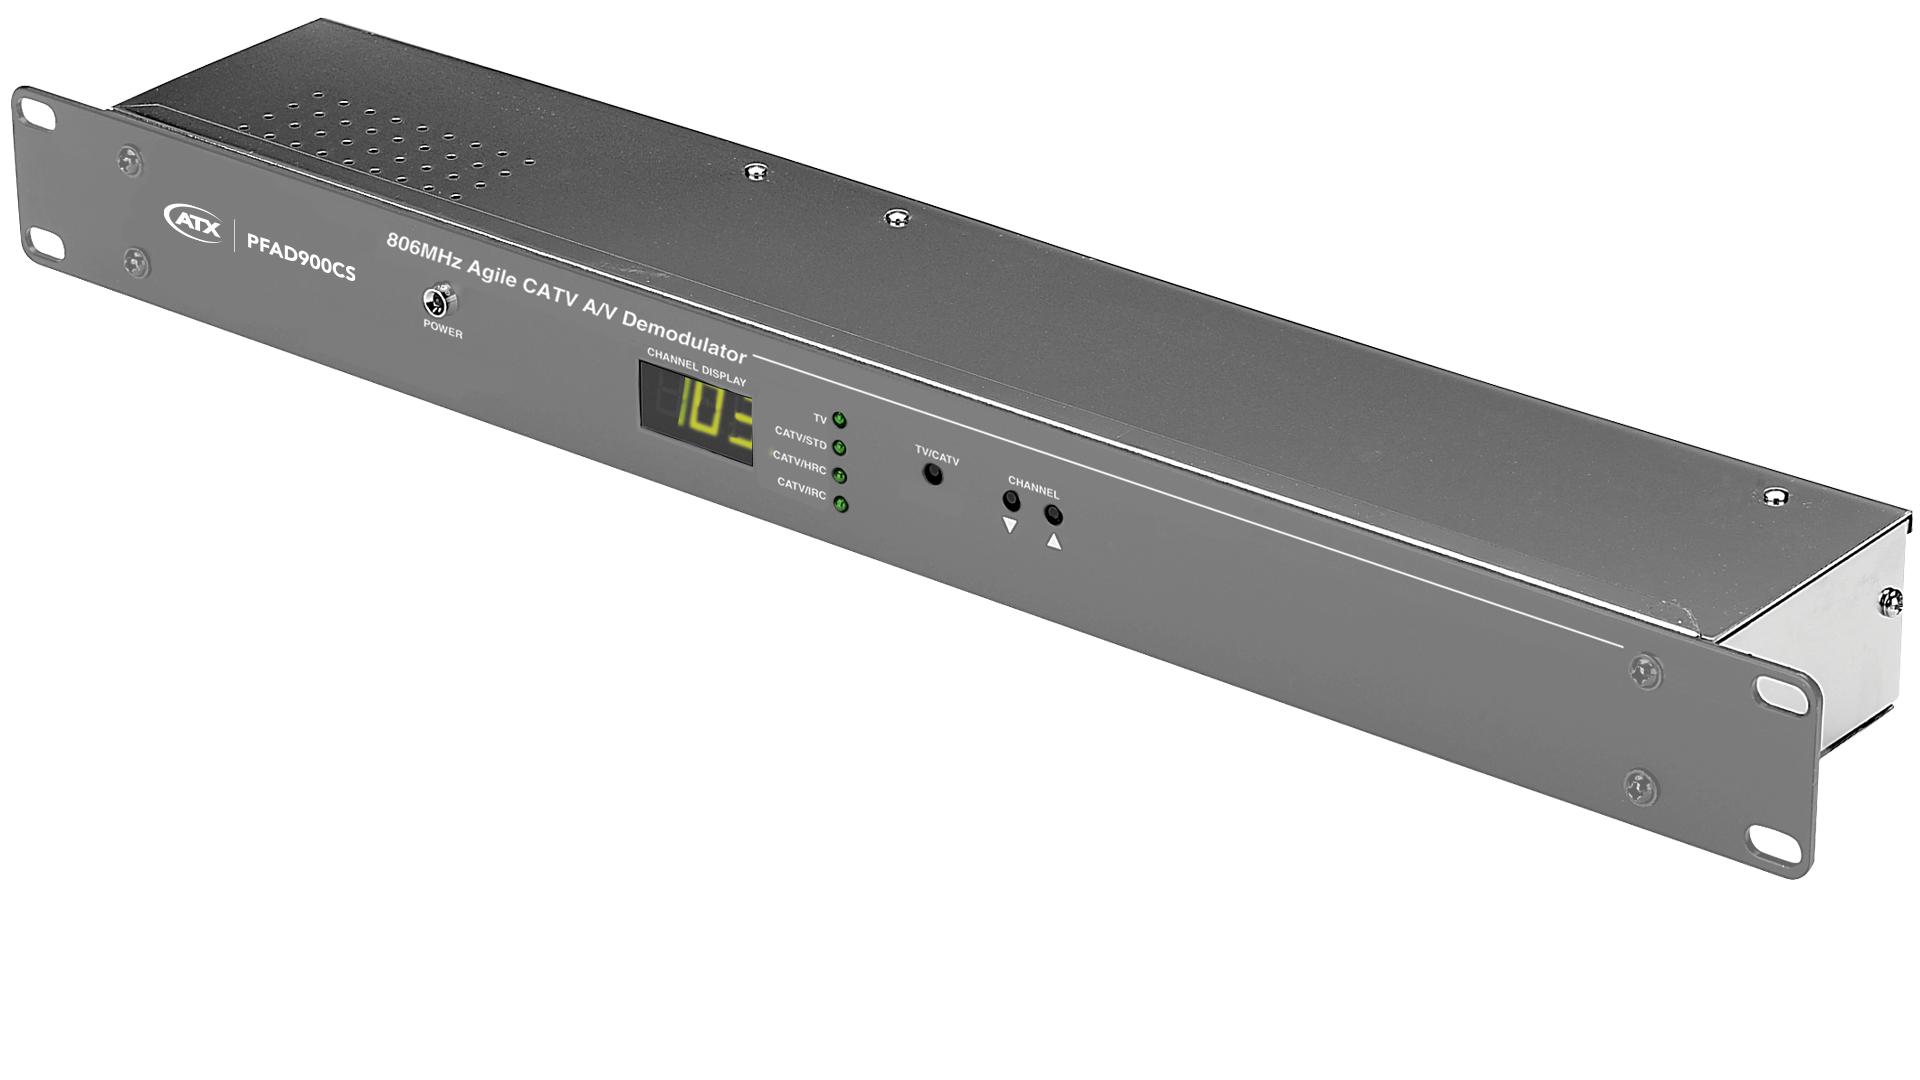 PFAD-900CS: Stereo Agile CATV A/V Demodulator